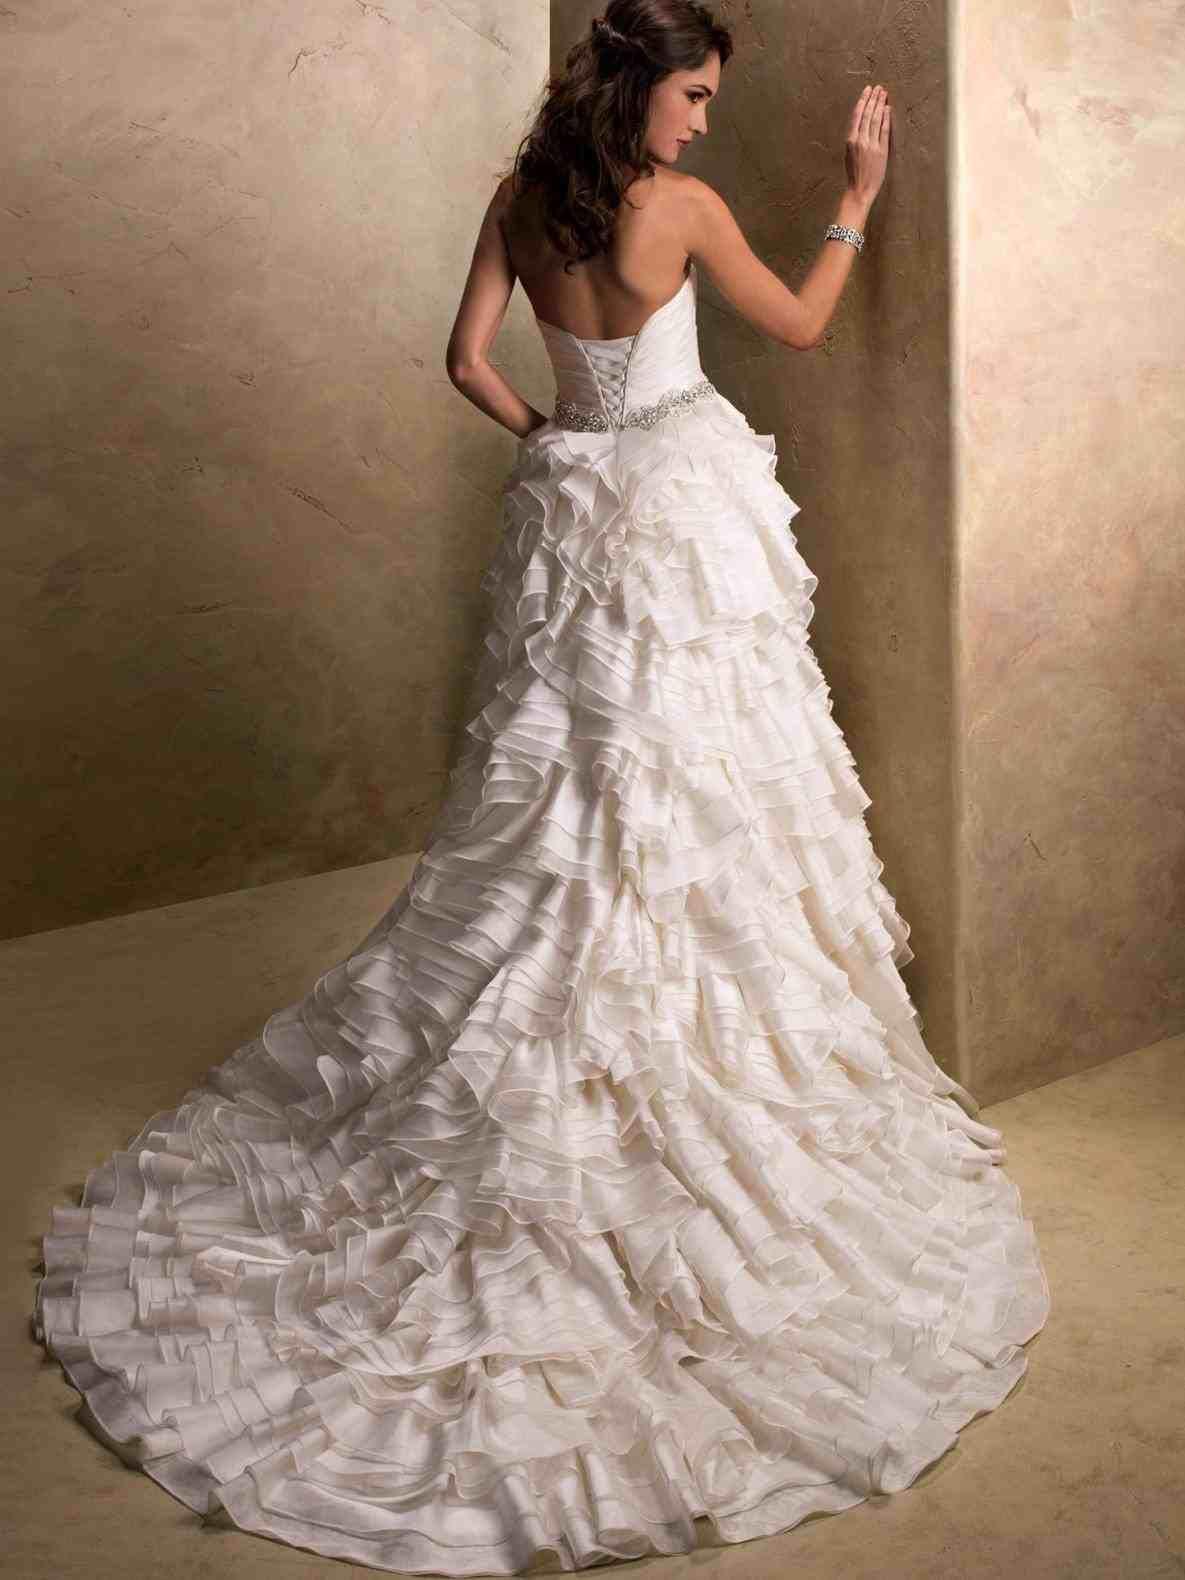 Top 10 New Post Wedding Dresses Corset Bodice Visit Wedbridal Site